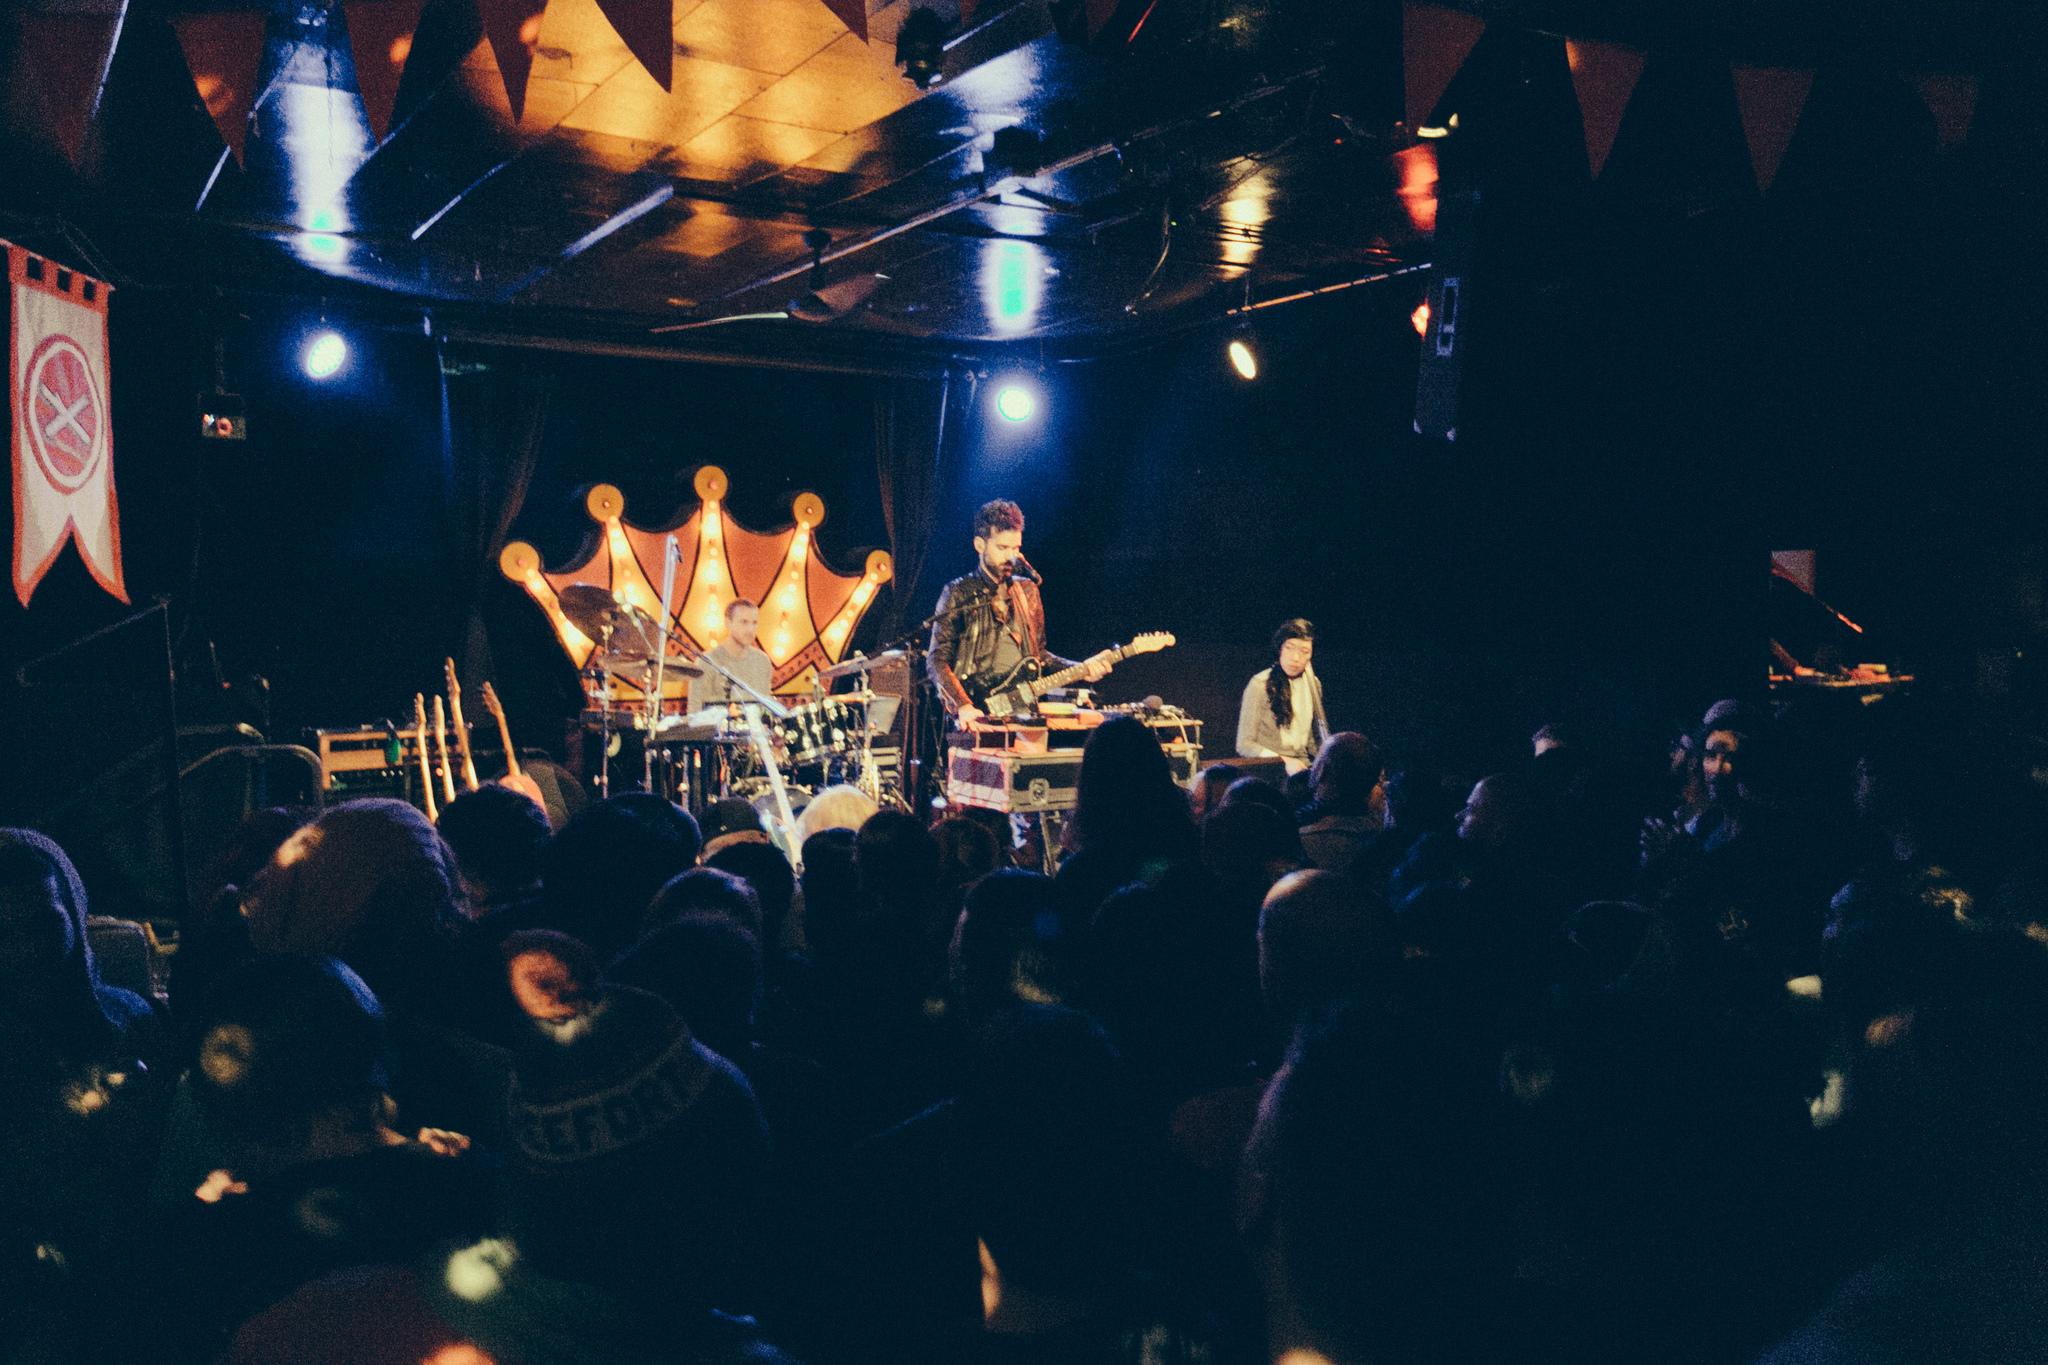 Treefort 2015-Wordell-7260 | ©Treefort Music Fest/Flickr